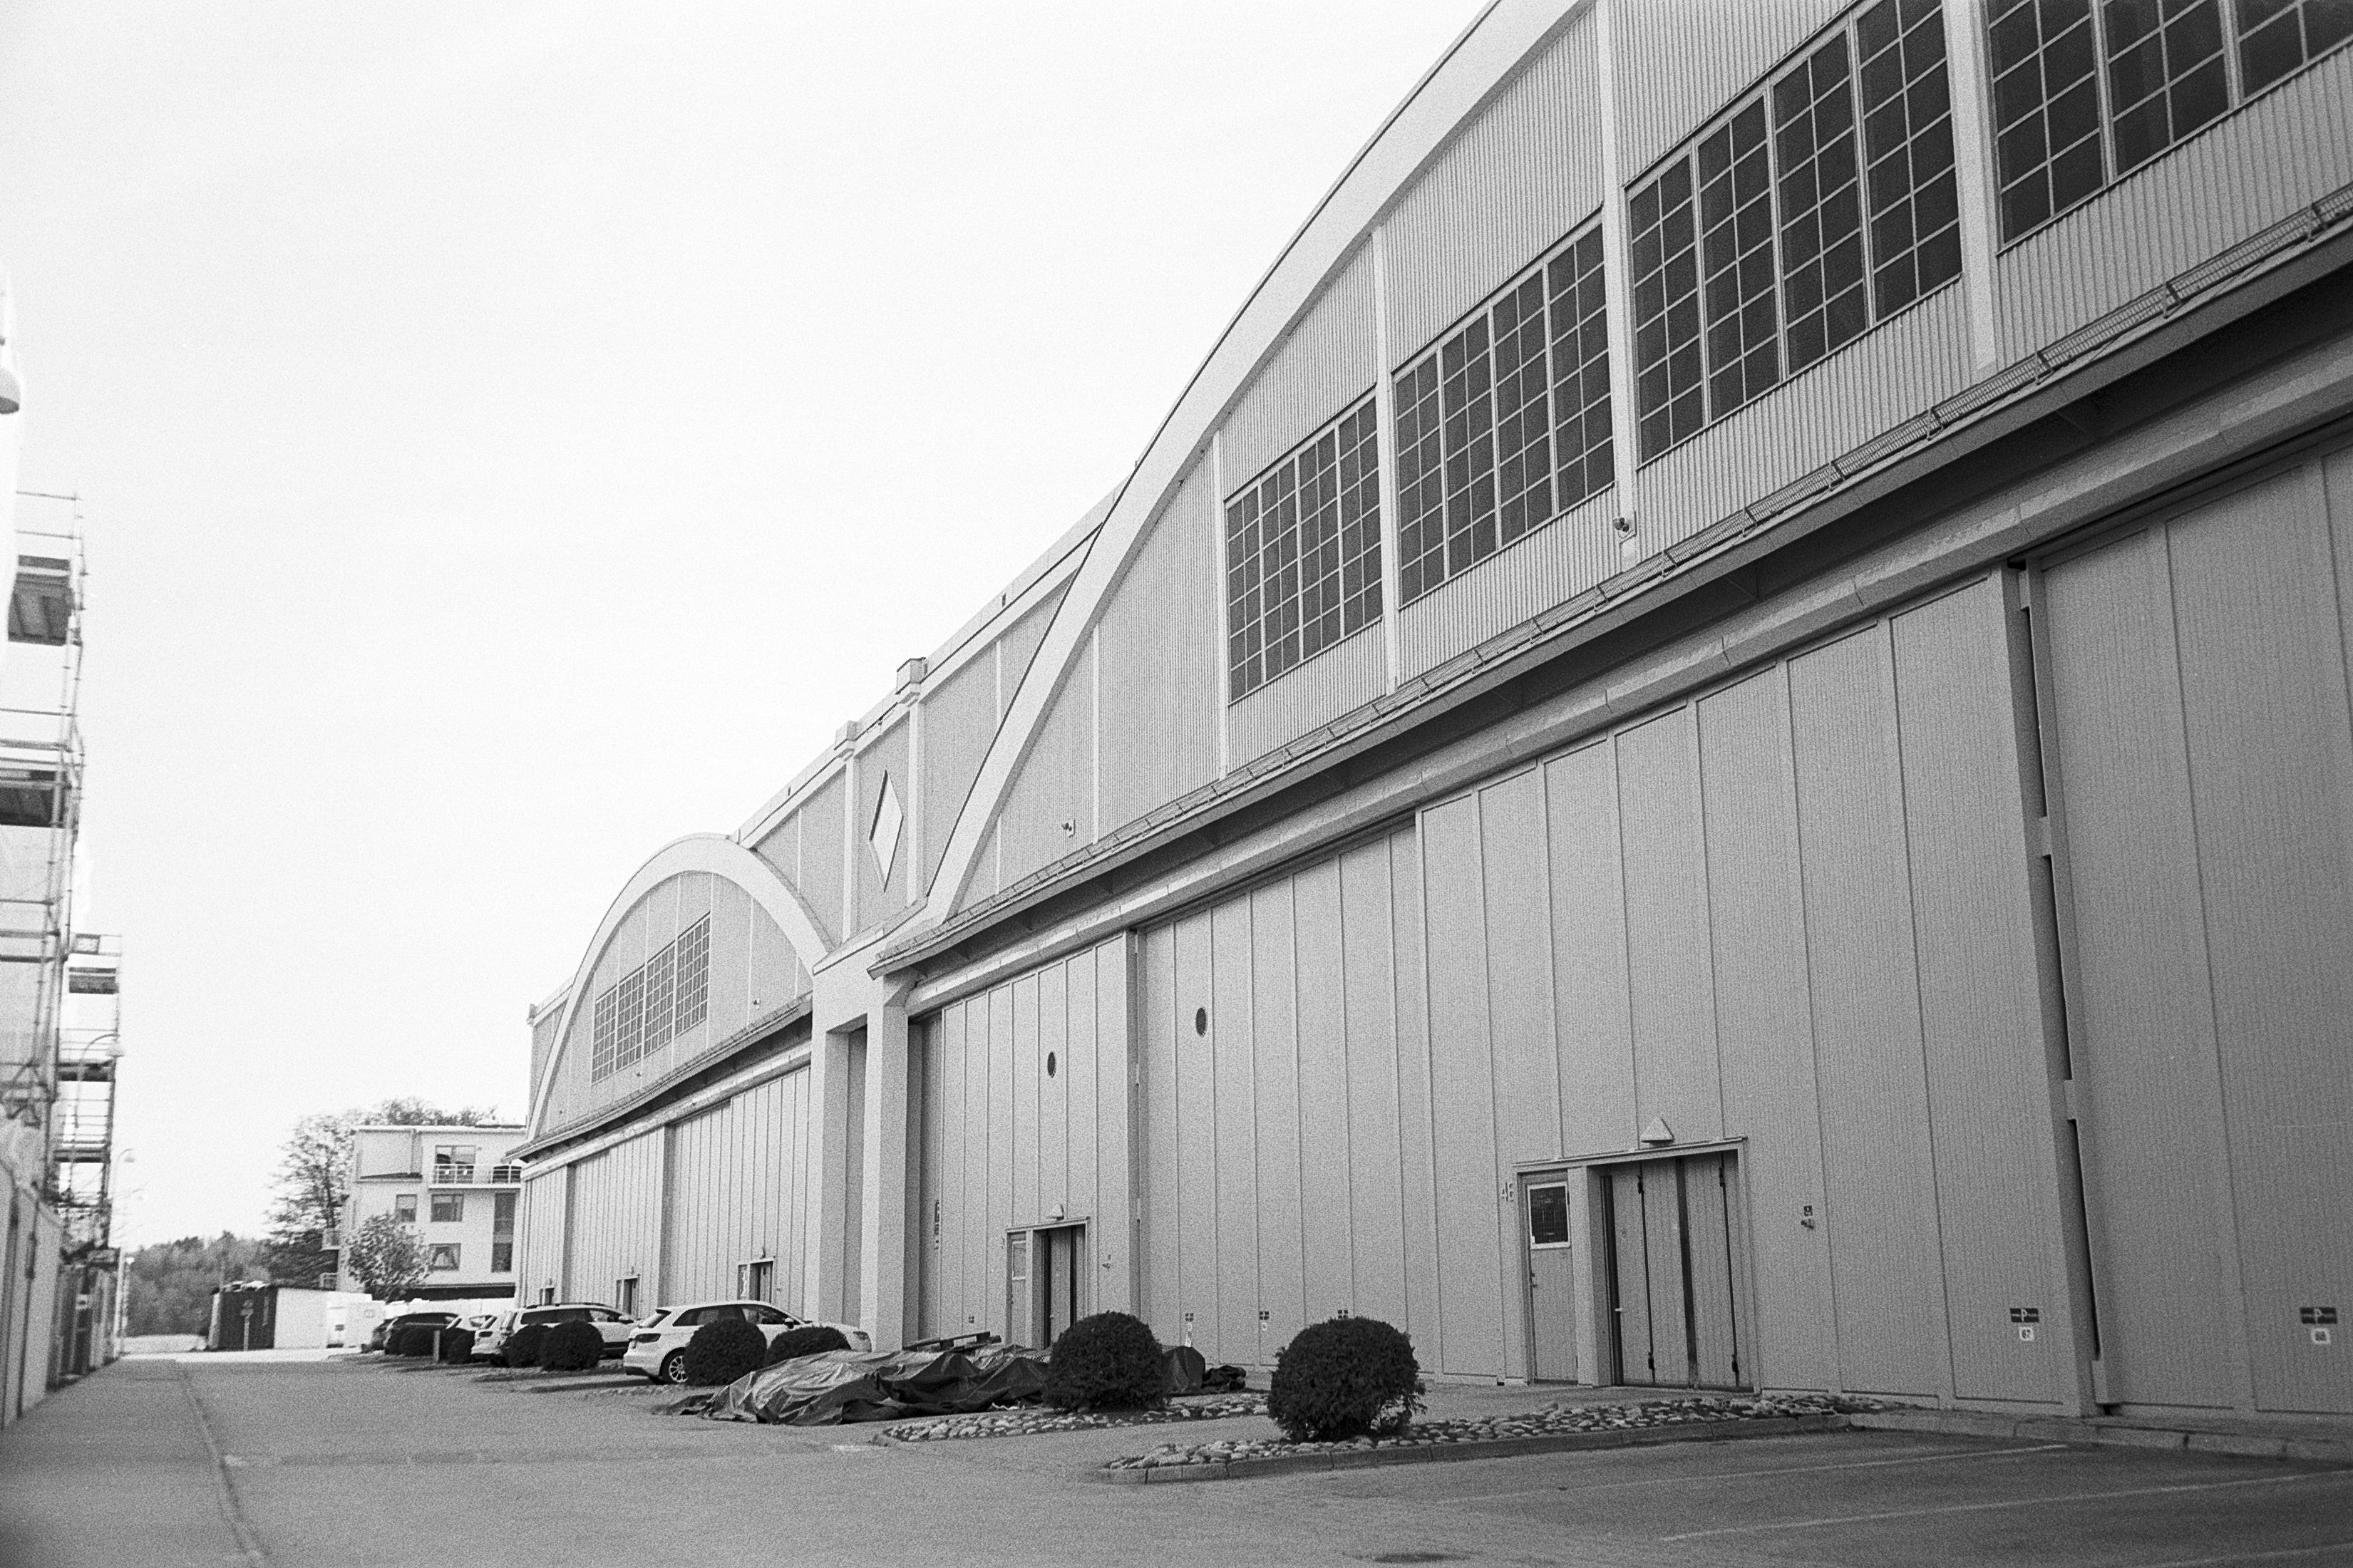 Hangars at F2 base (Pic: Skoge Farman)